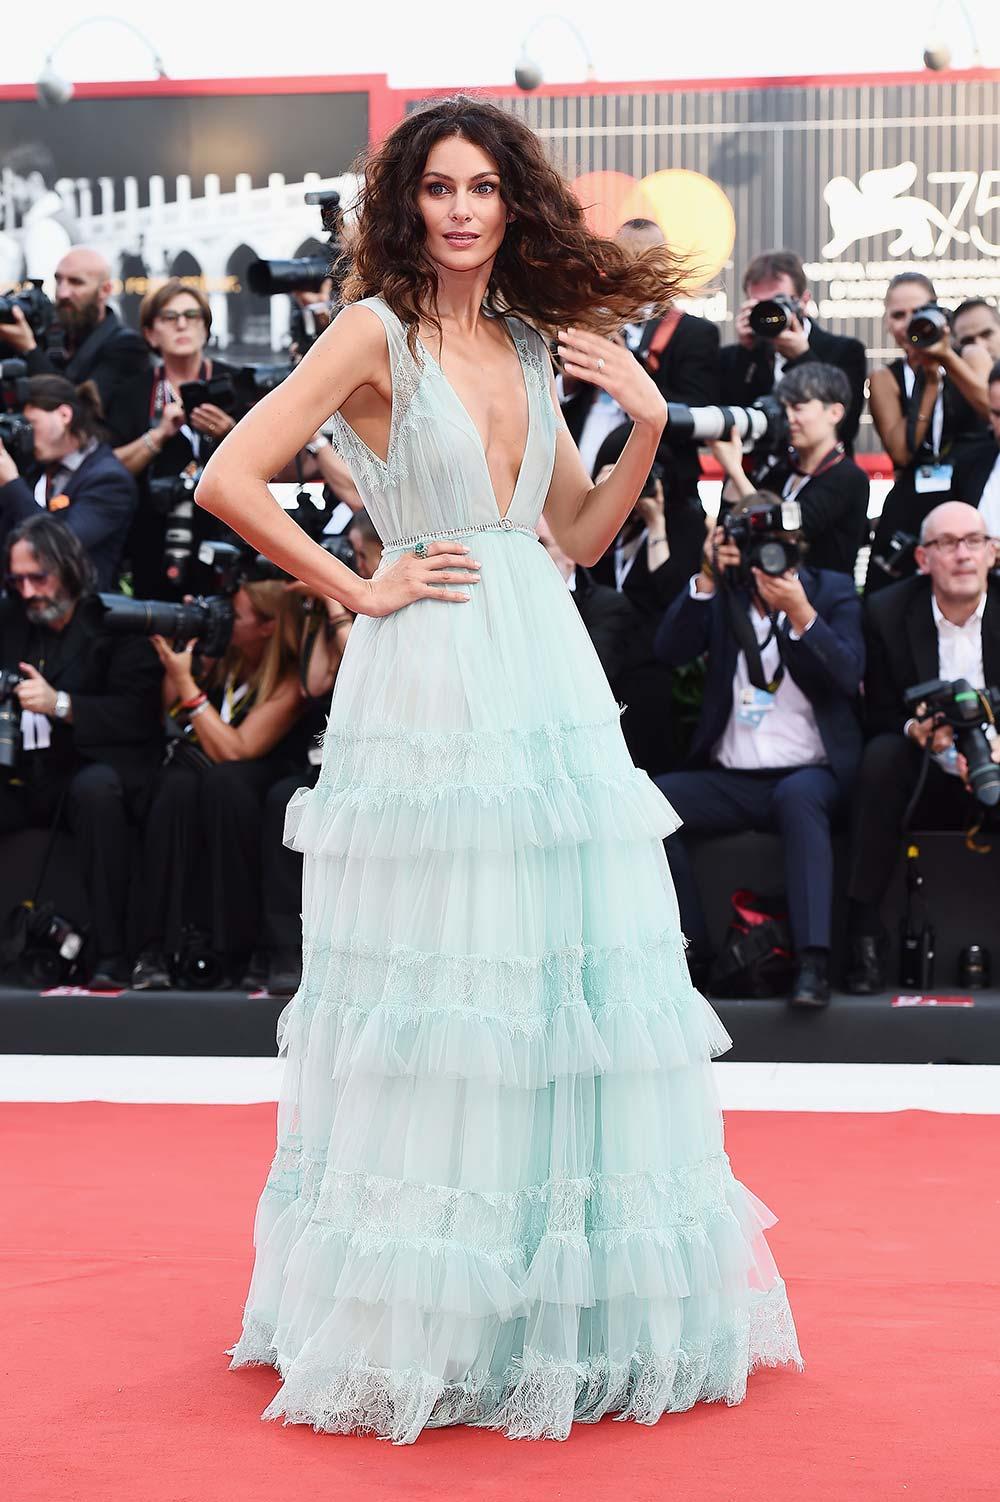 Venezia 2018 - Paola Turani - Hair & Makeup - Massimo Serini